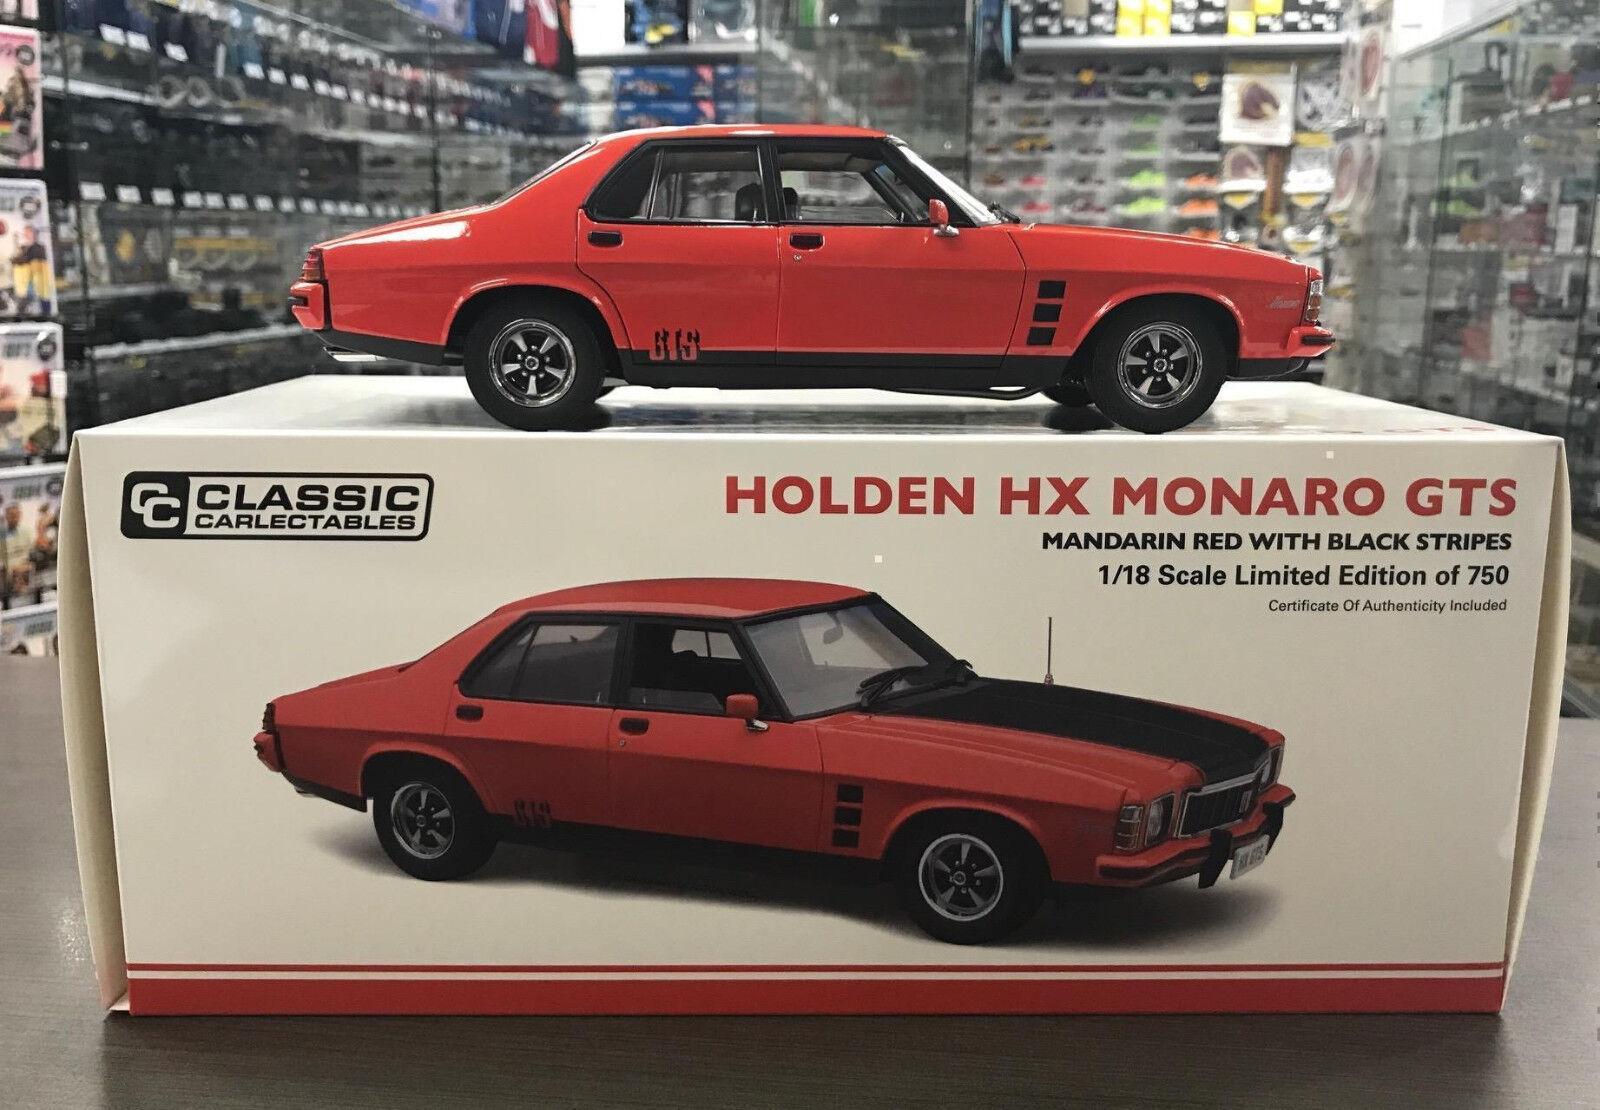 1976 holden hx gts mandarin rote 1,18 skala druckguss - modell - auto